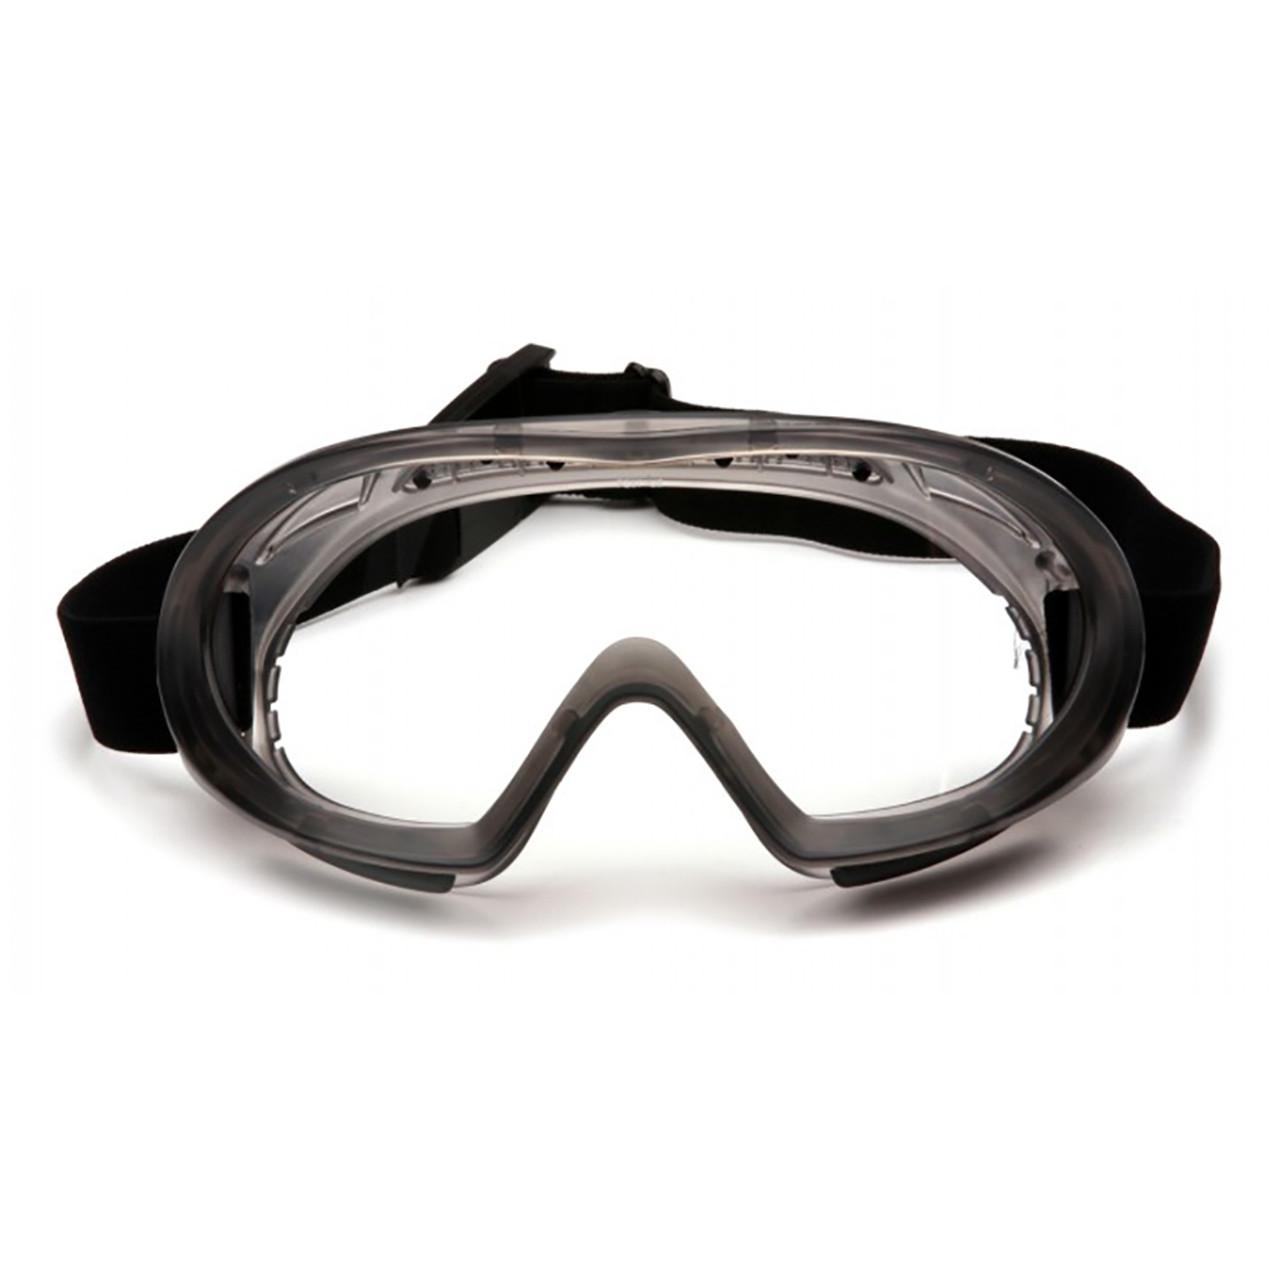 Pyramex Capstone Series Goggle with H2MAX Anti-Fog Lens